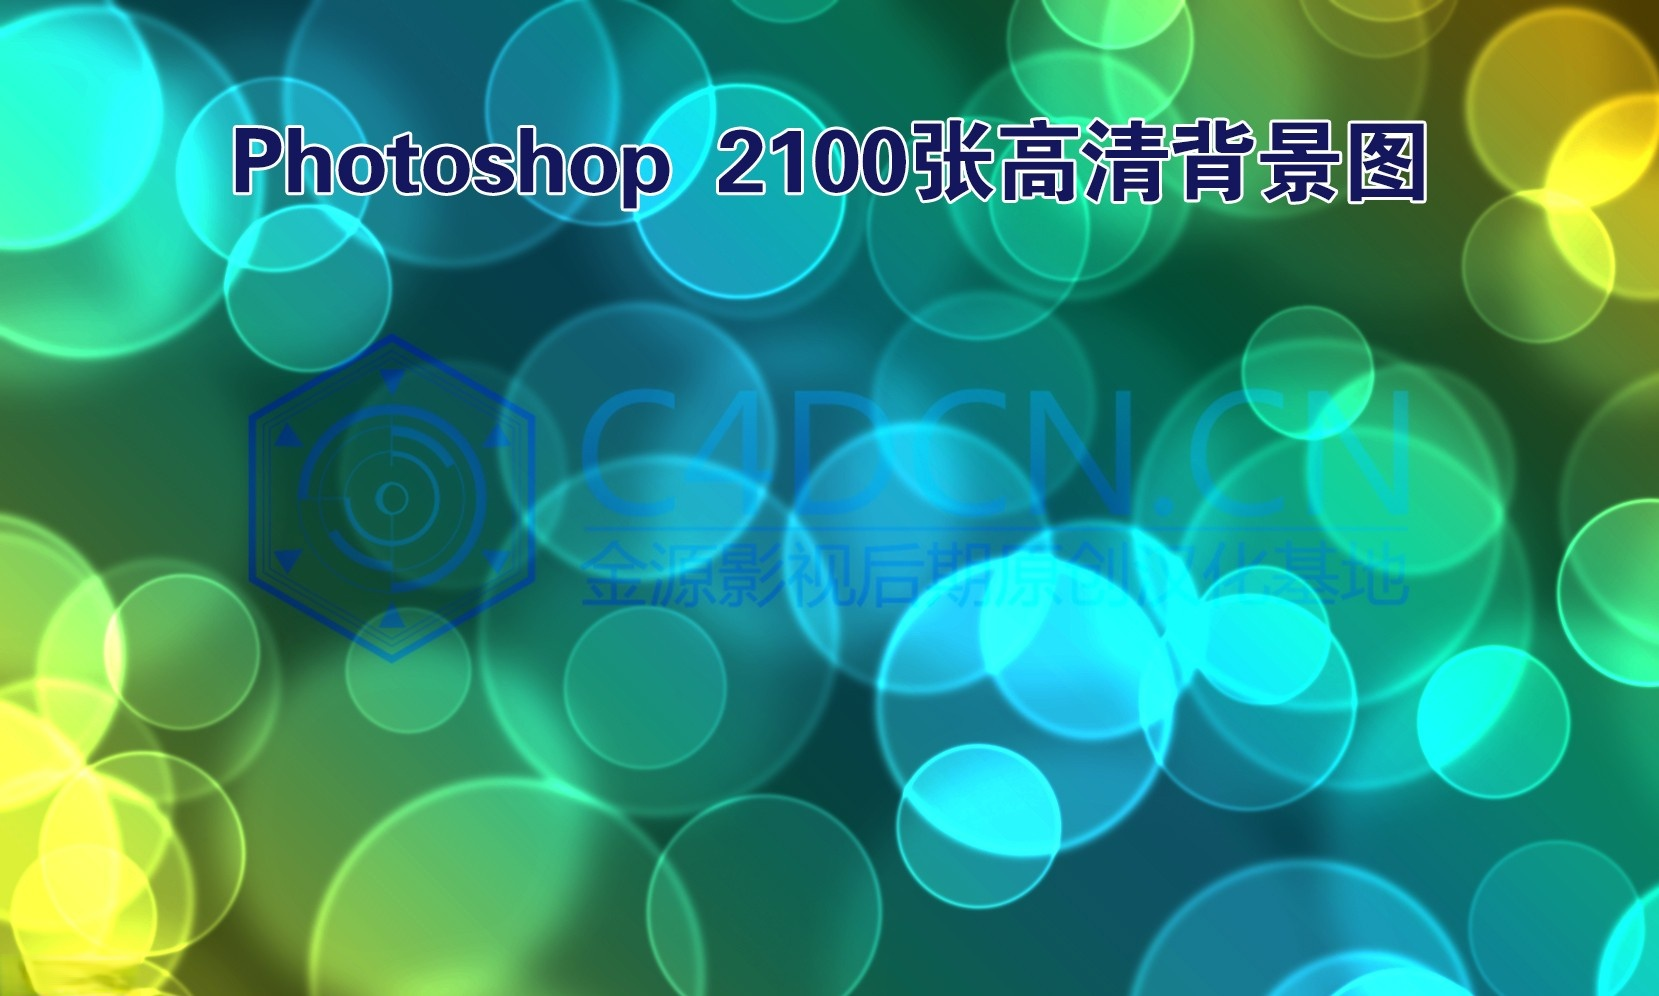 photoshop 图片素材库(2100张高清背景图)